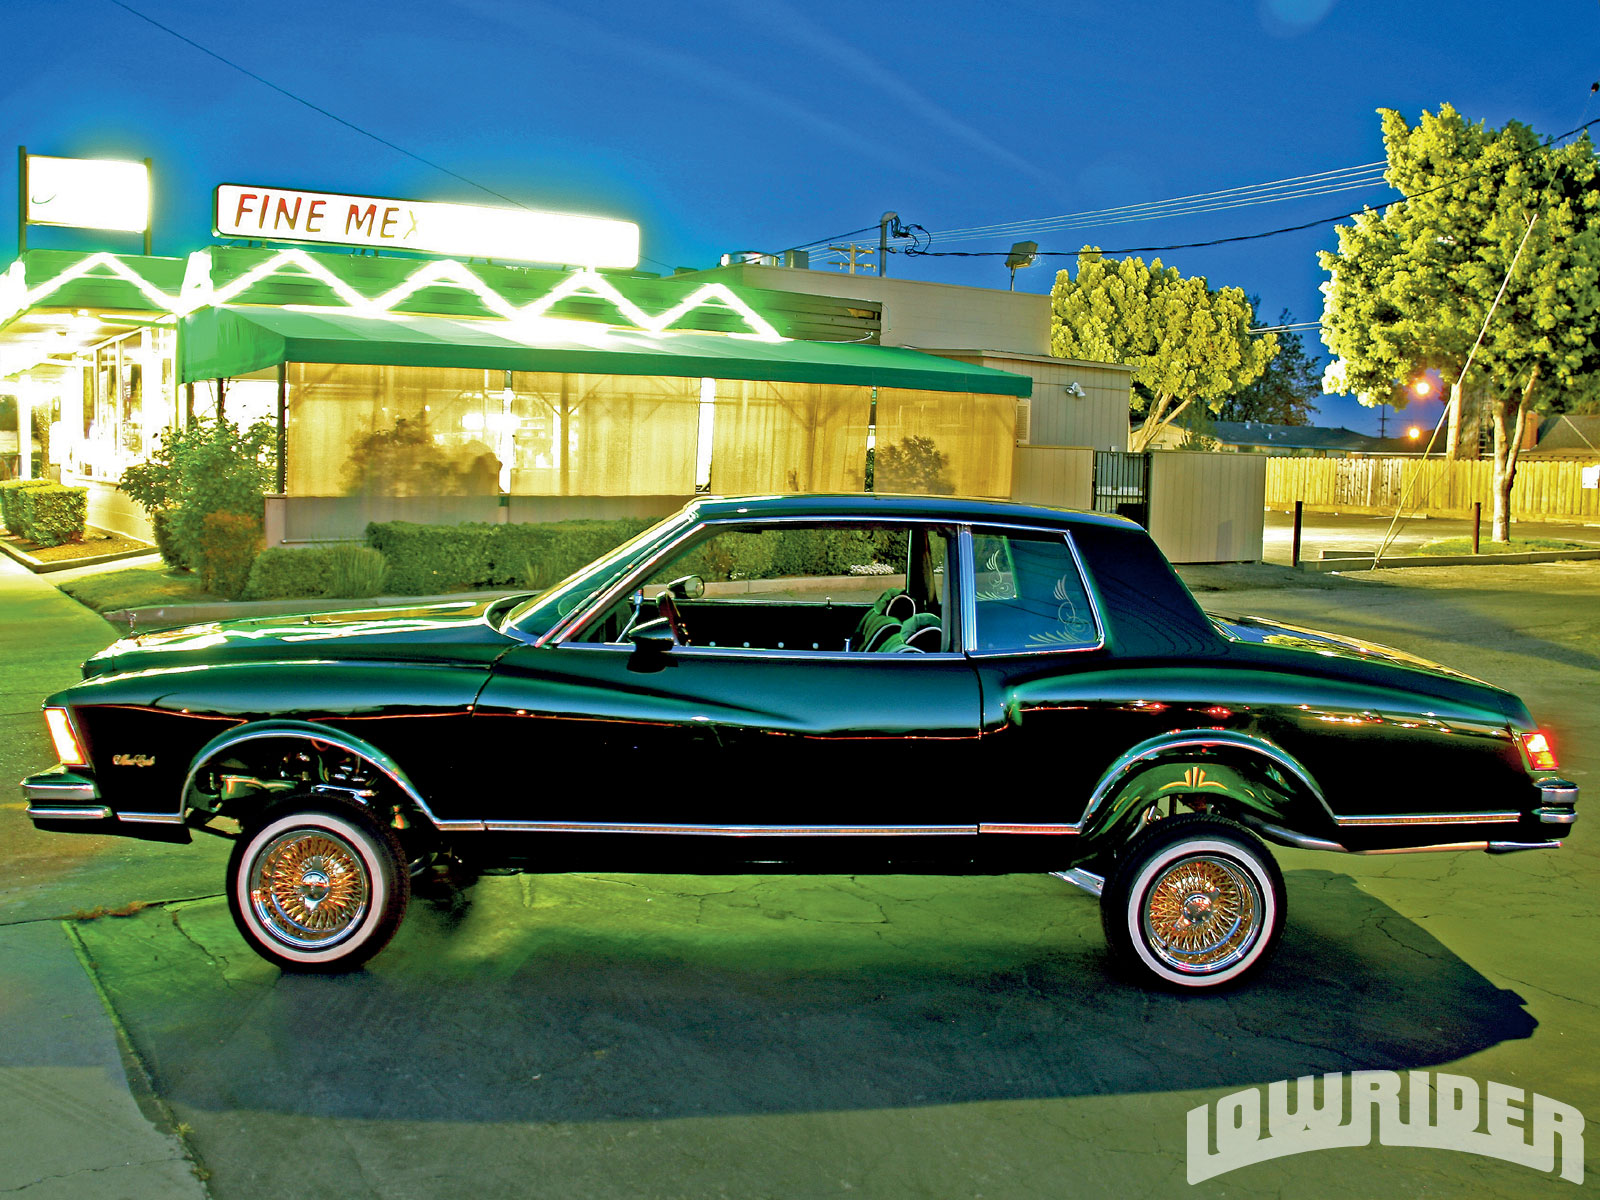 1979 Chevrolet Monte Carlo - Lowrider Magazine